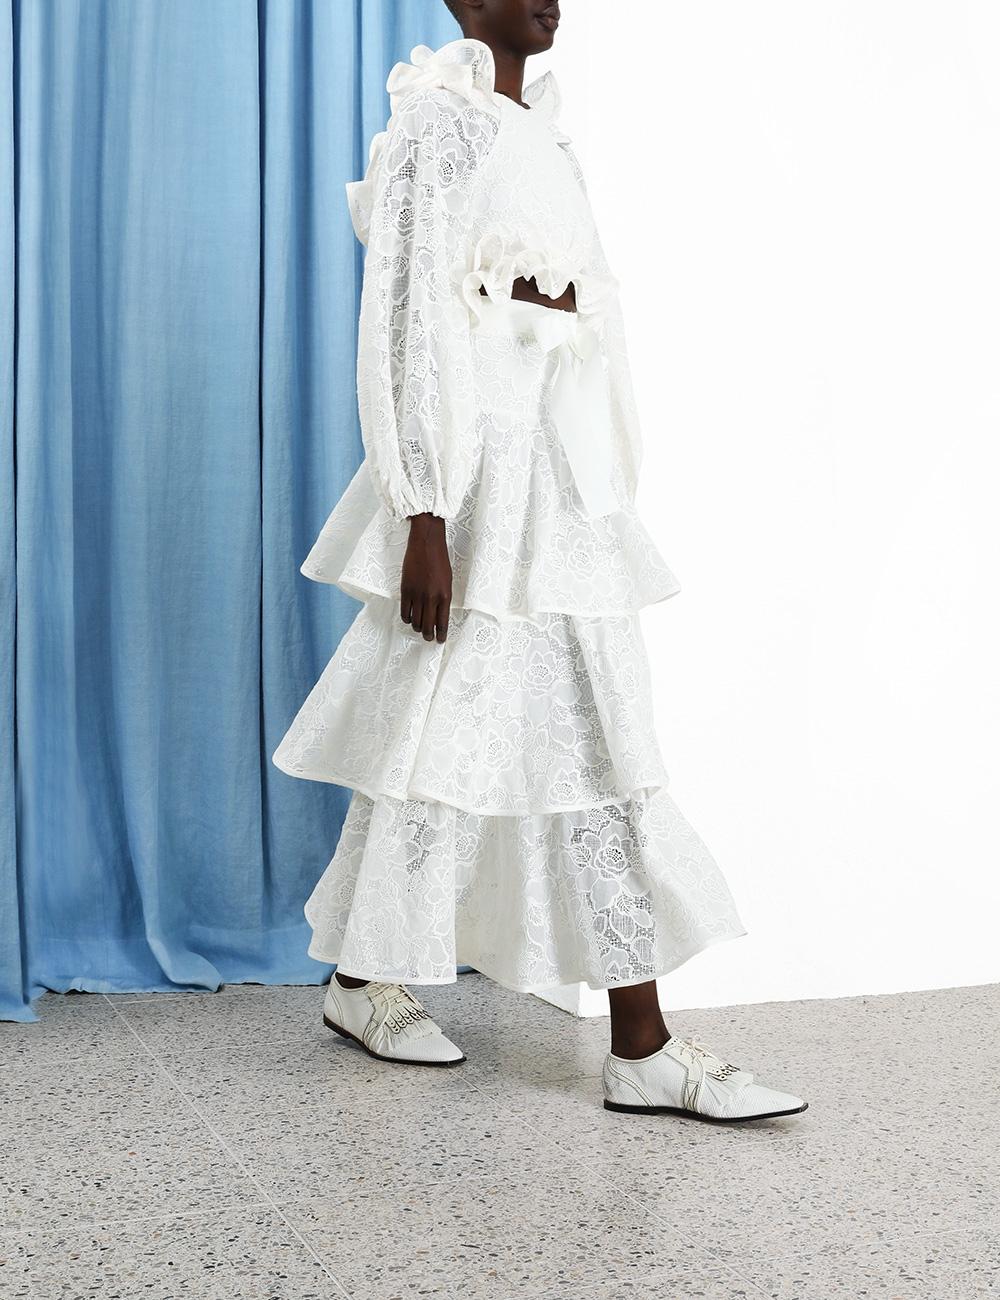 The Lovestruck Lace Skirt